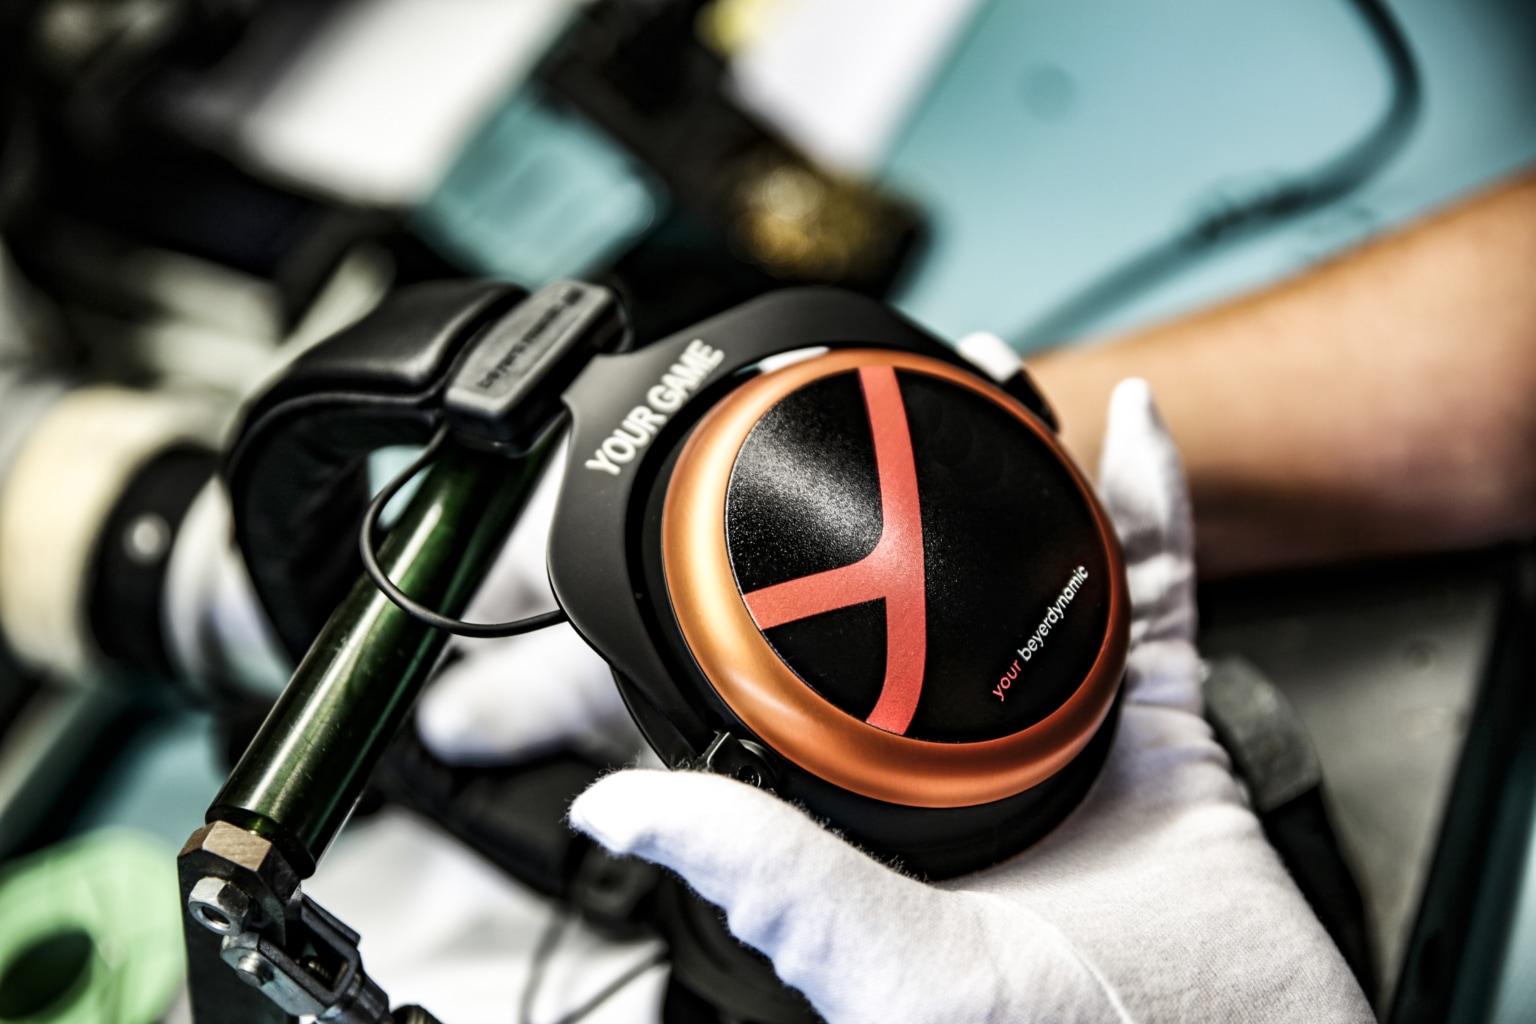 MMX 300 Manufaktur Endmontage